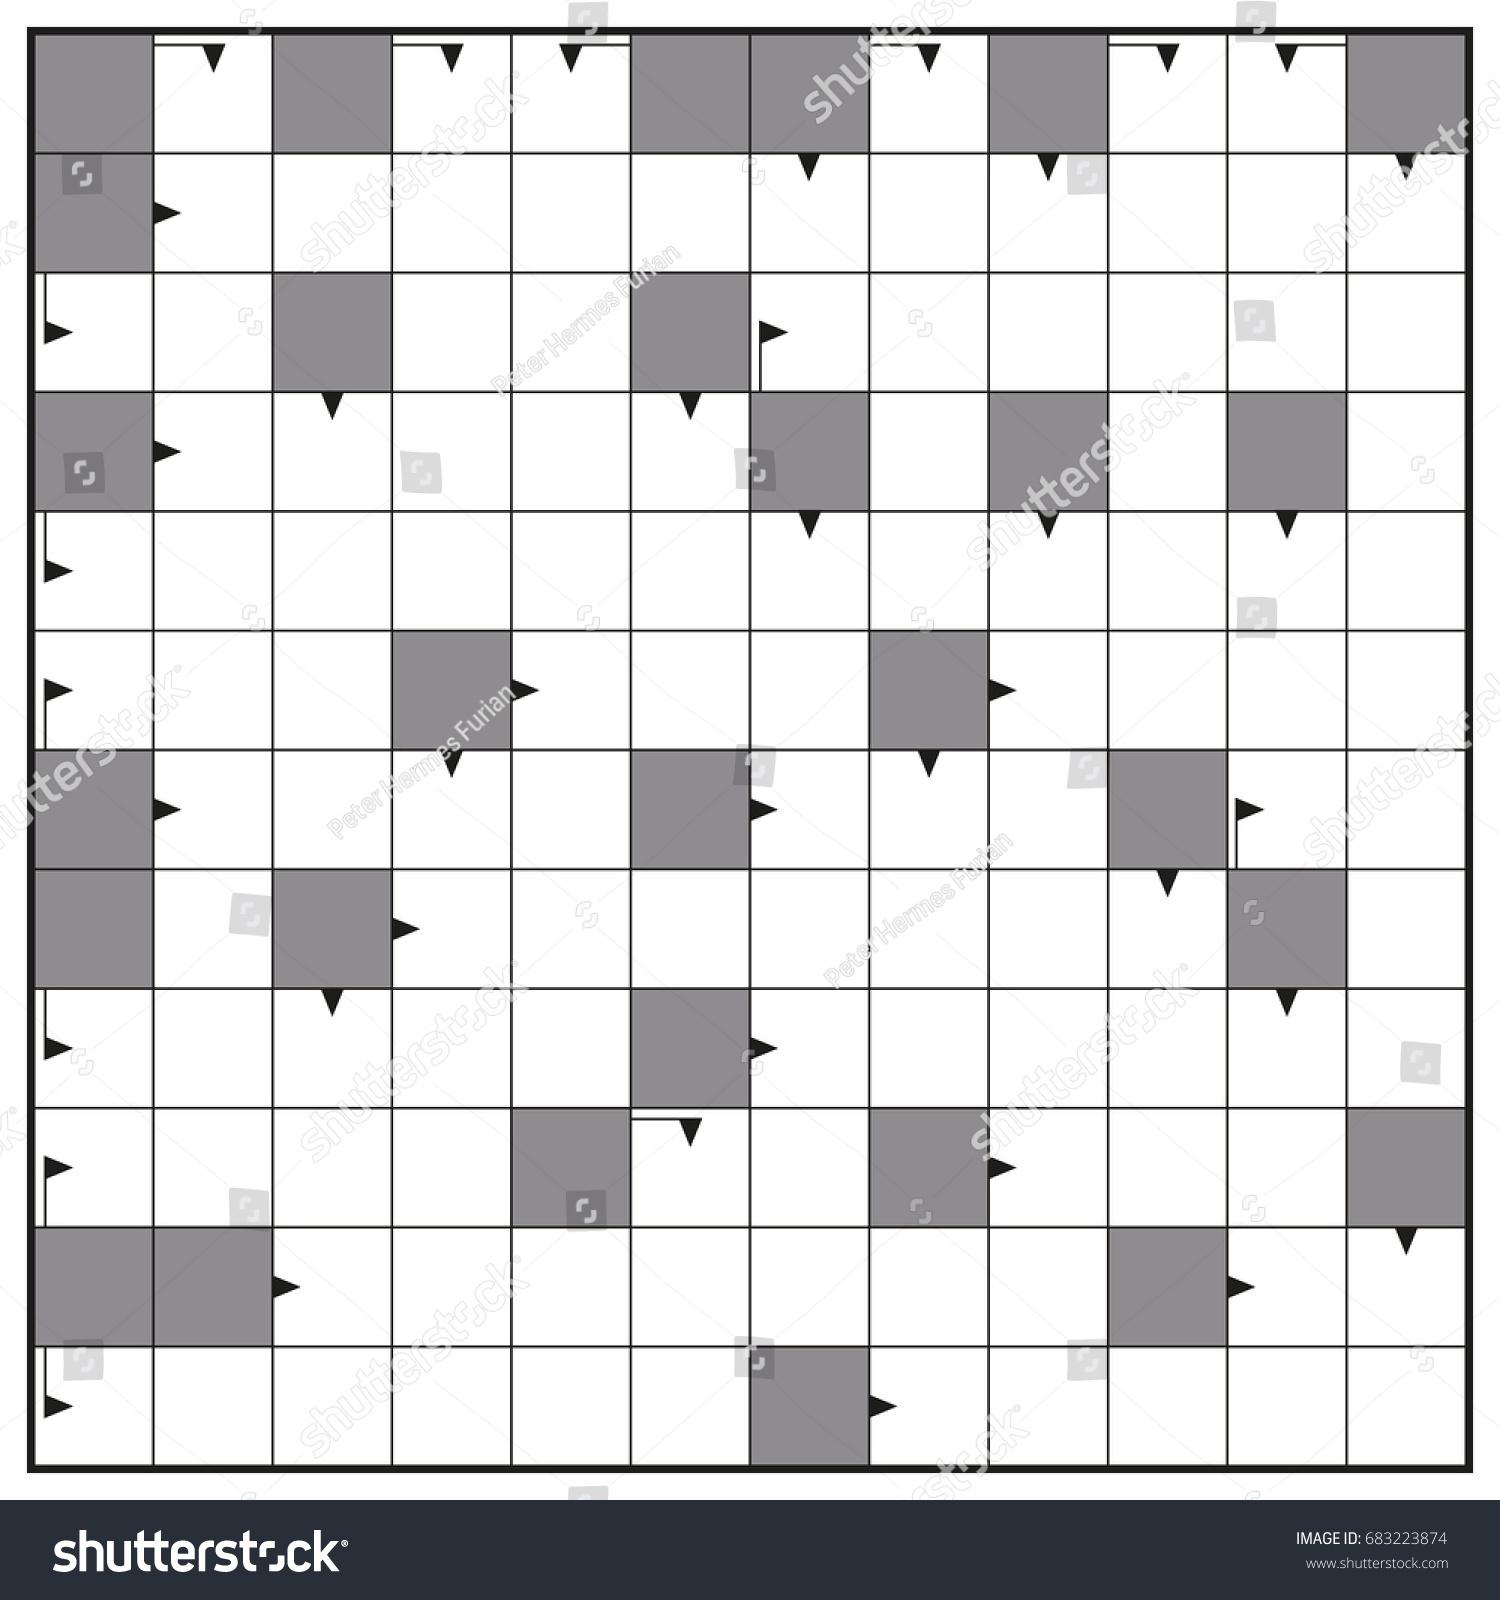 Crossword Blank Template Vip Pass Invitations Was Great – Blank Crossword Template